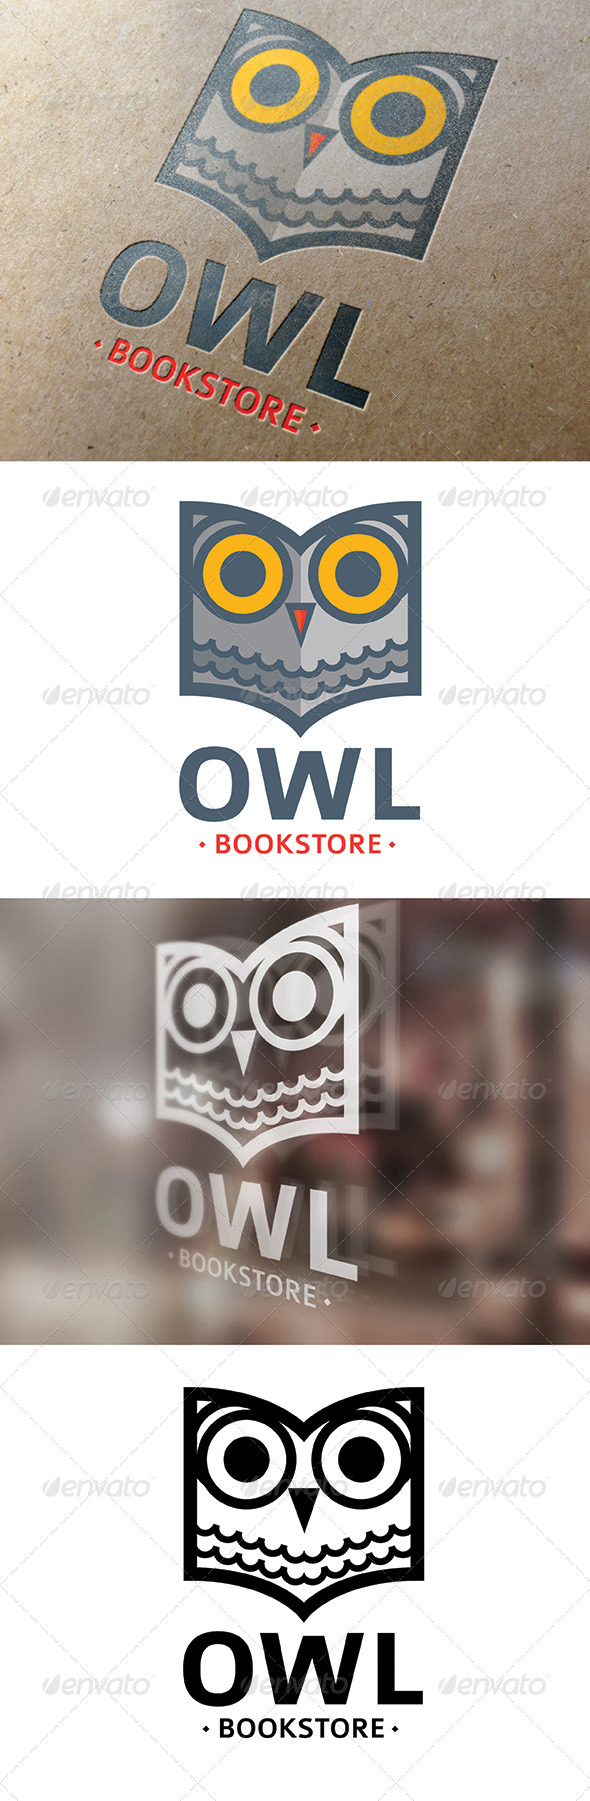 Owl Bookstore Logo